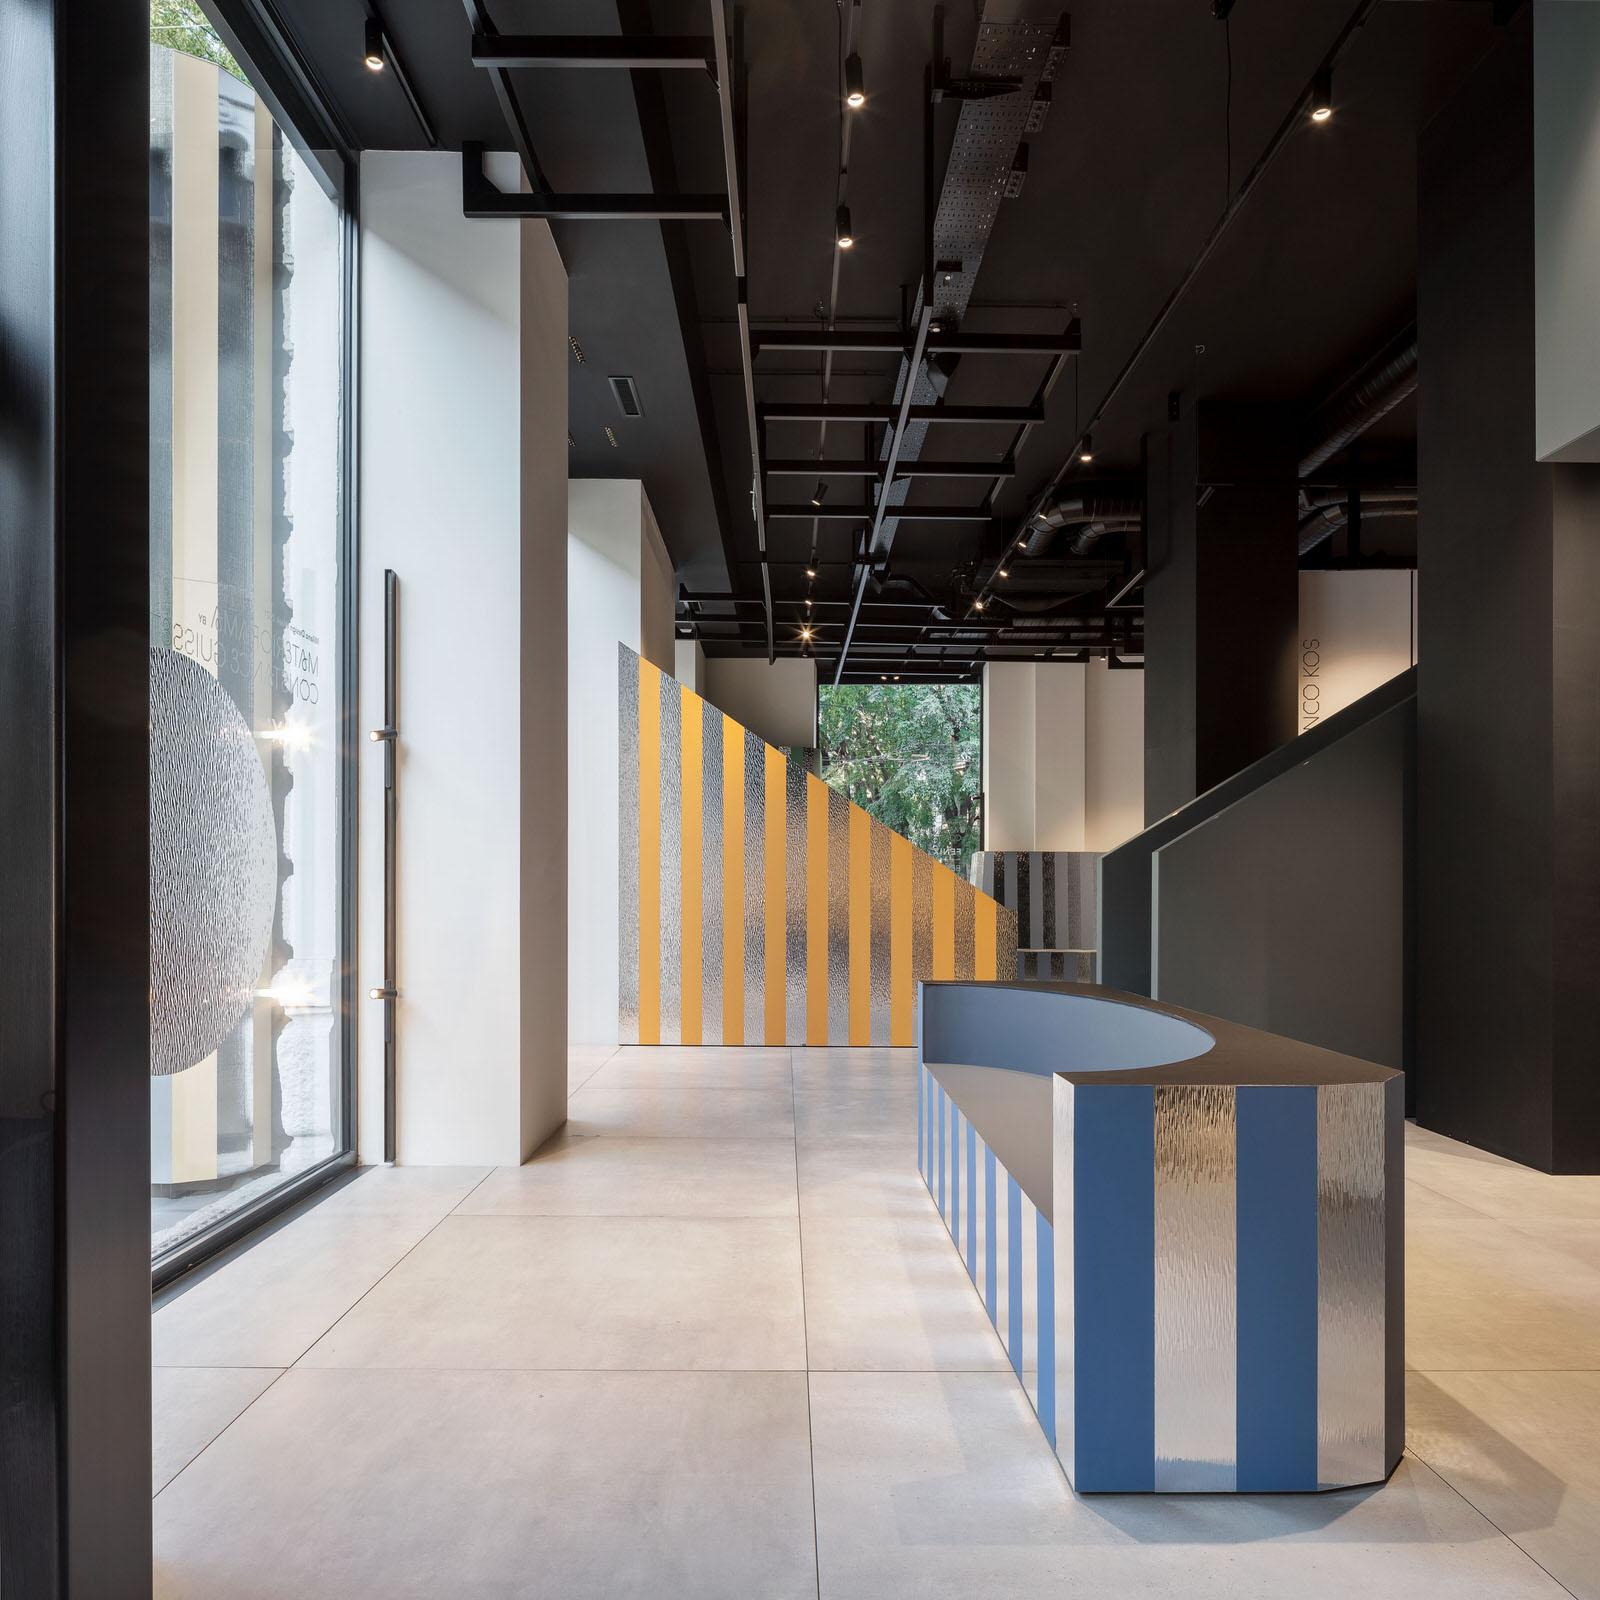 Yellowtrace Milan Design Week 2021 Materiorama Constance Guisset Fenix Scenario 03